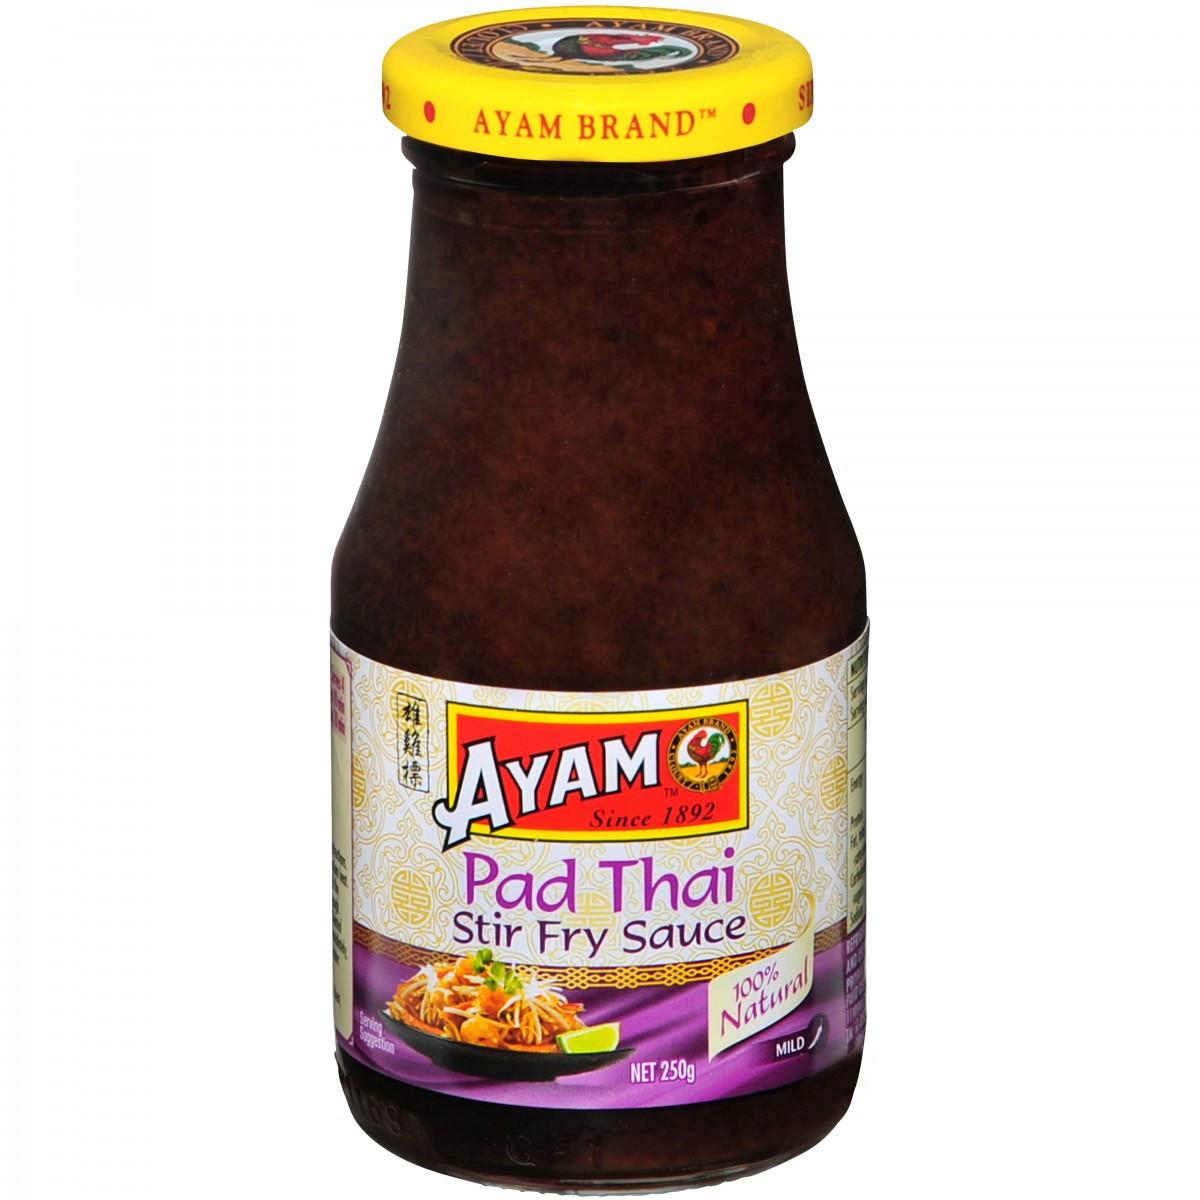 Thai Stir Fry Sauces  Pad Thai Stir Fry Sauce 250g x 6 Stir Fry Sauces Shop